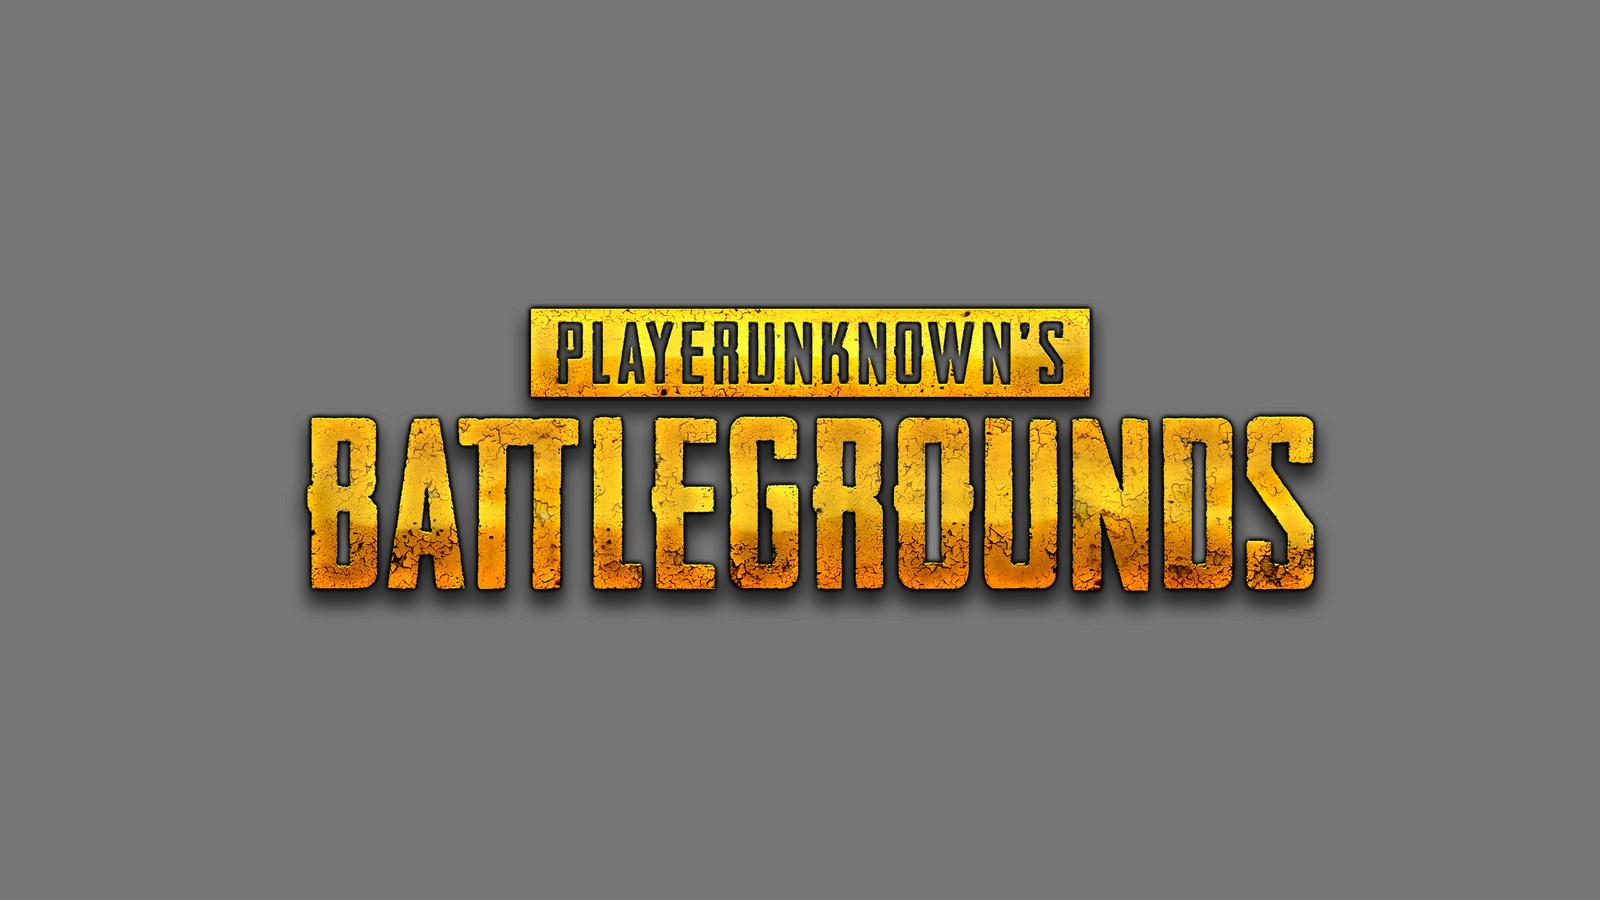 playerunknowns-battlegrounds-logo-5k-k1.jpg